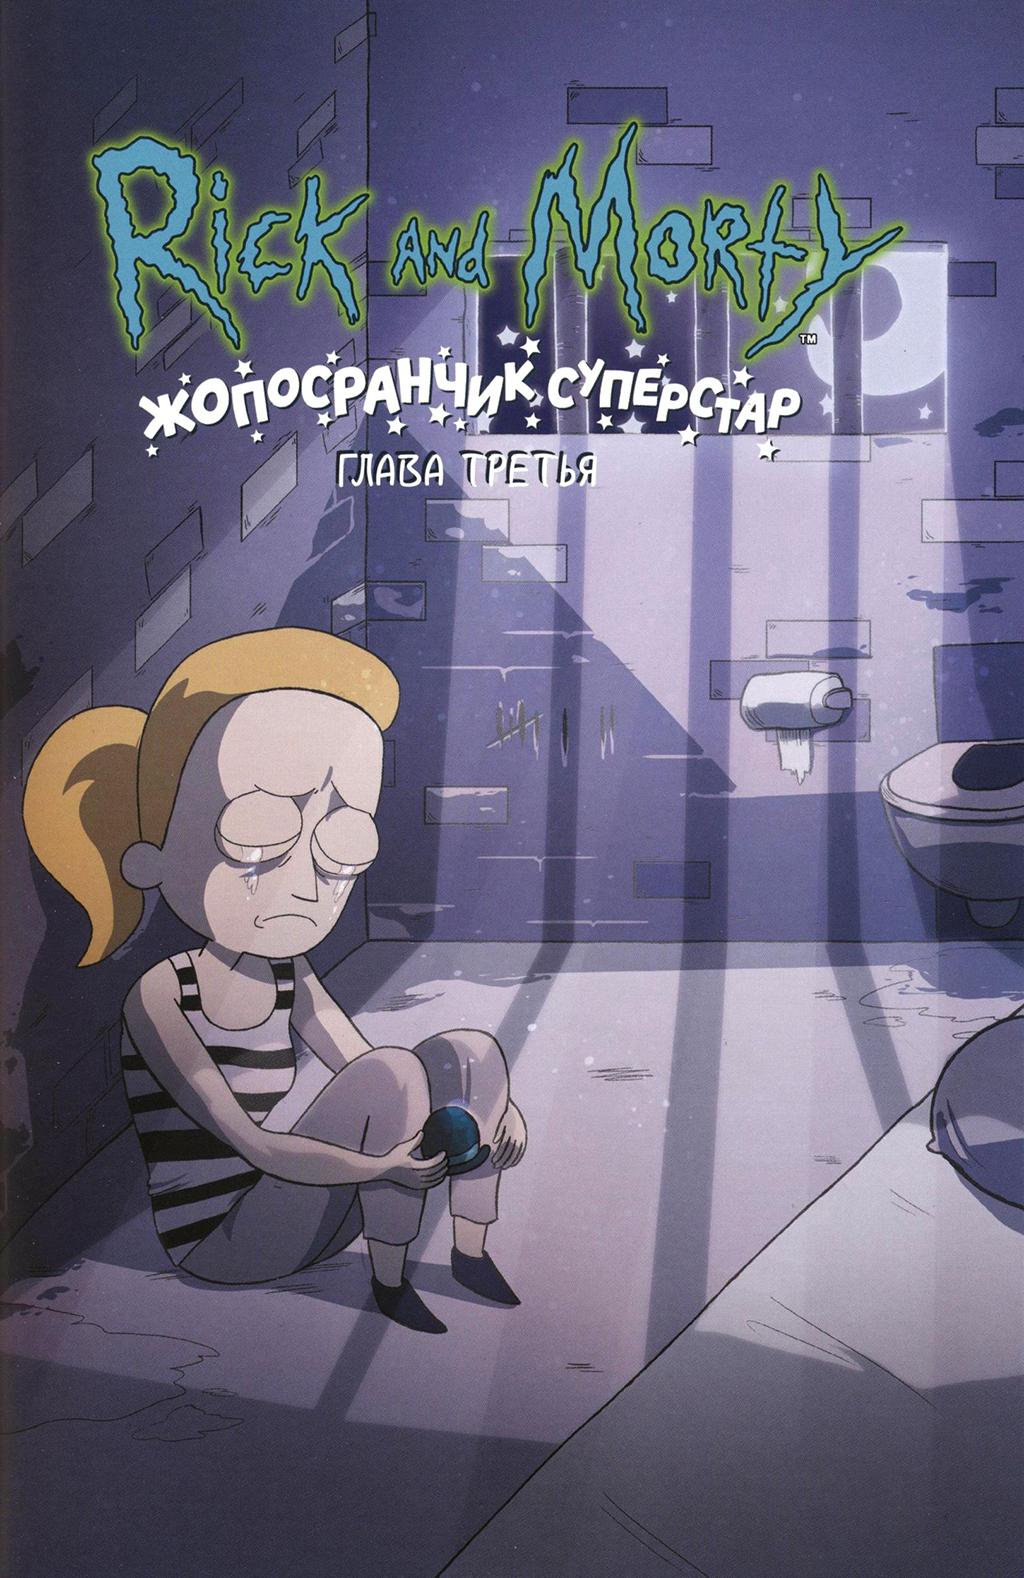 Комикс Рик и Морти - Жопосранчик Суперстар